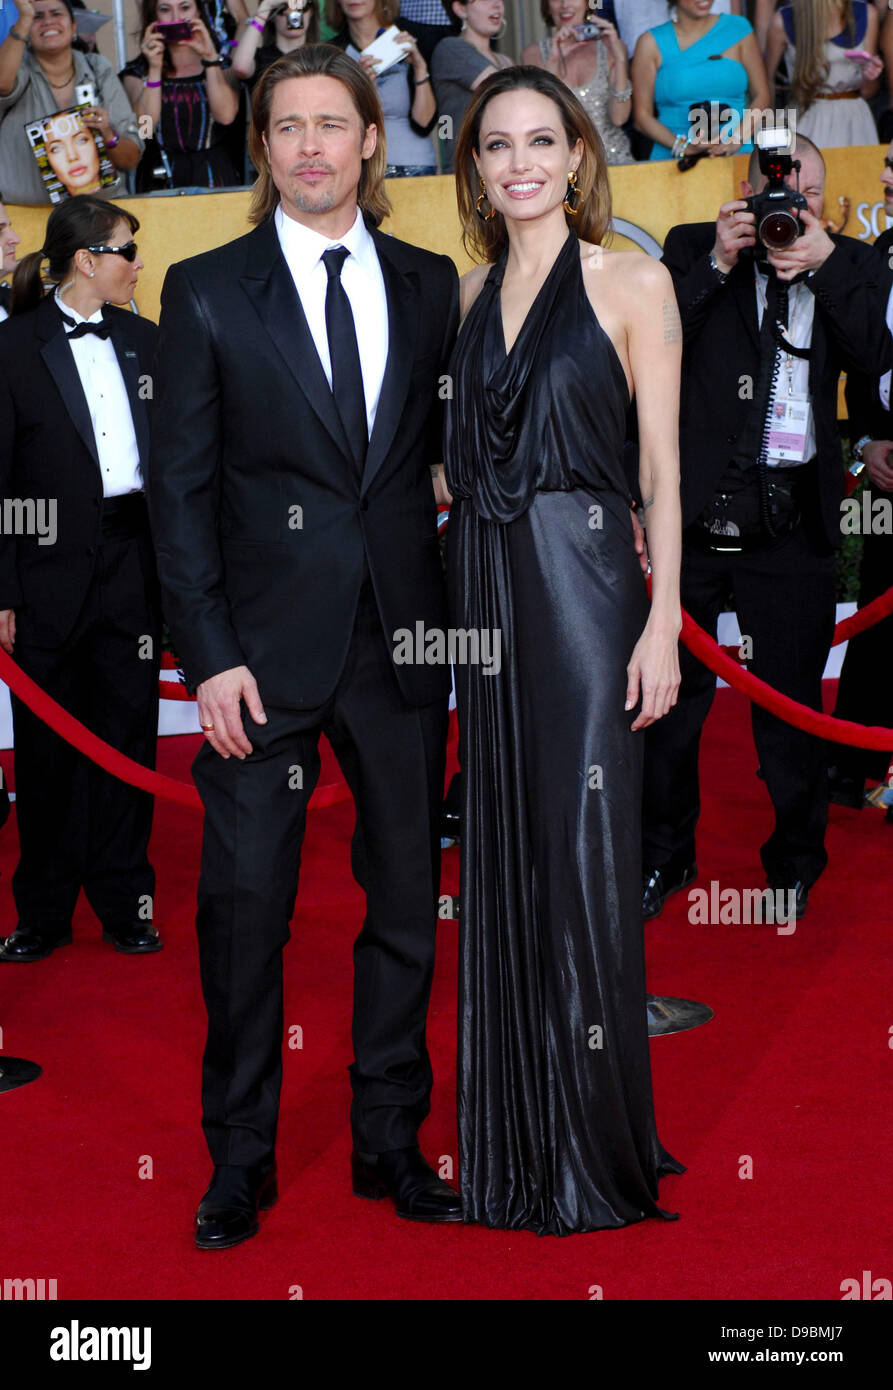 Brad Pitt, Angelina Jolie 18. Annual Screen Actors Guild Awards (SAG Awards) abgehaltenen The Shrine Auditorium Stockfoto